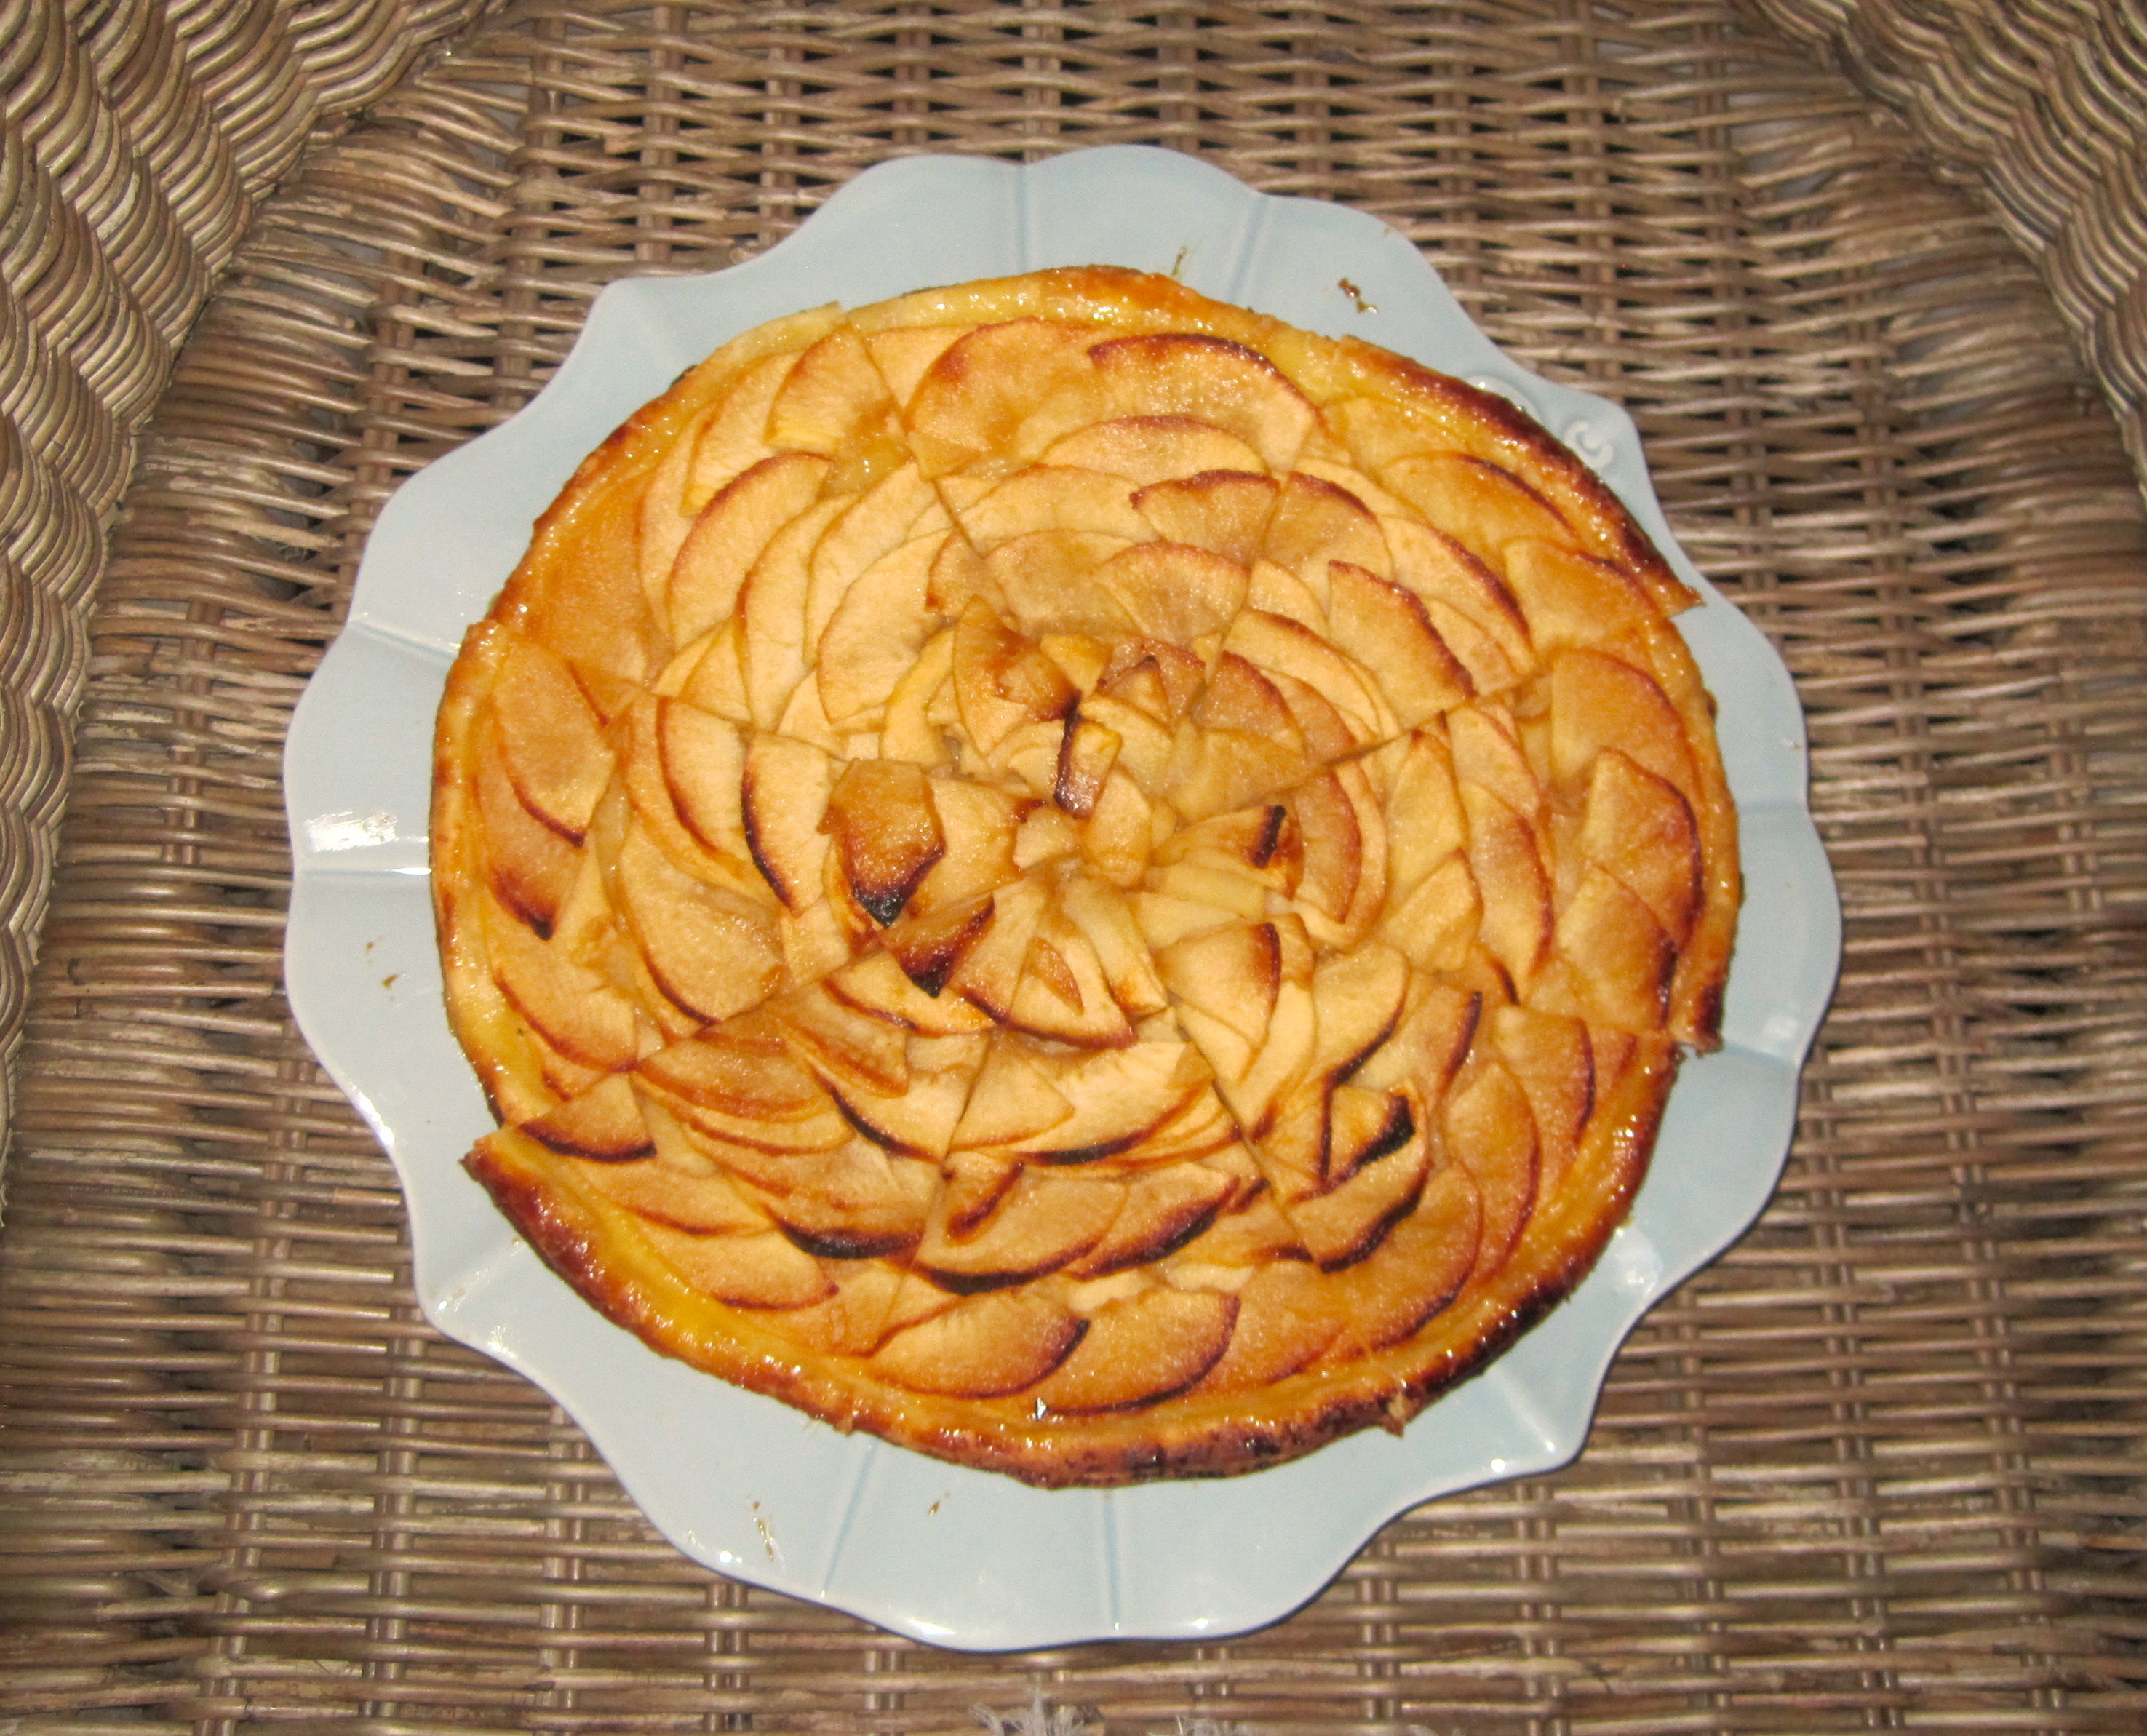 Torta de maçã - Jacky Favre